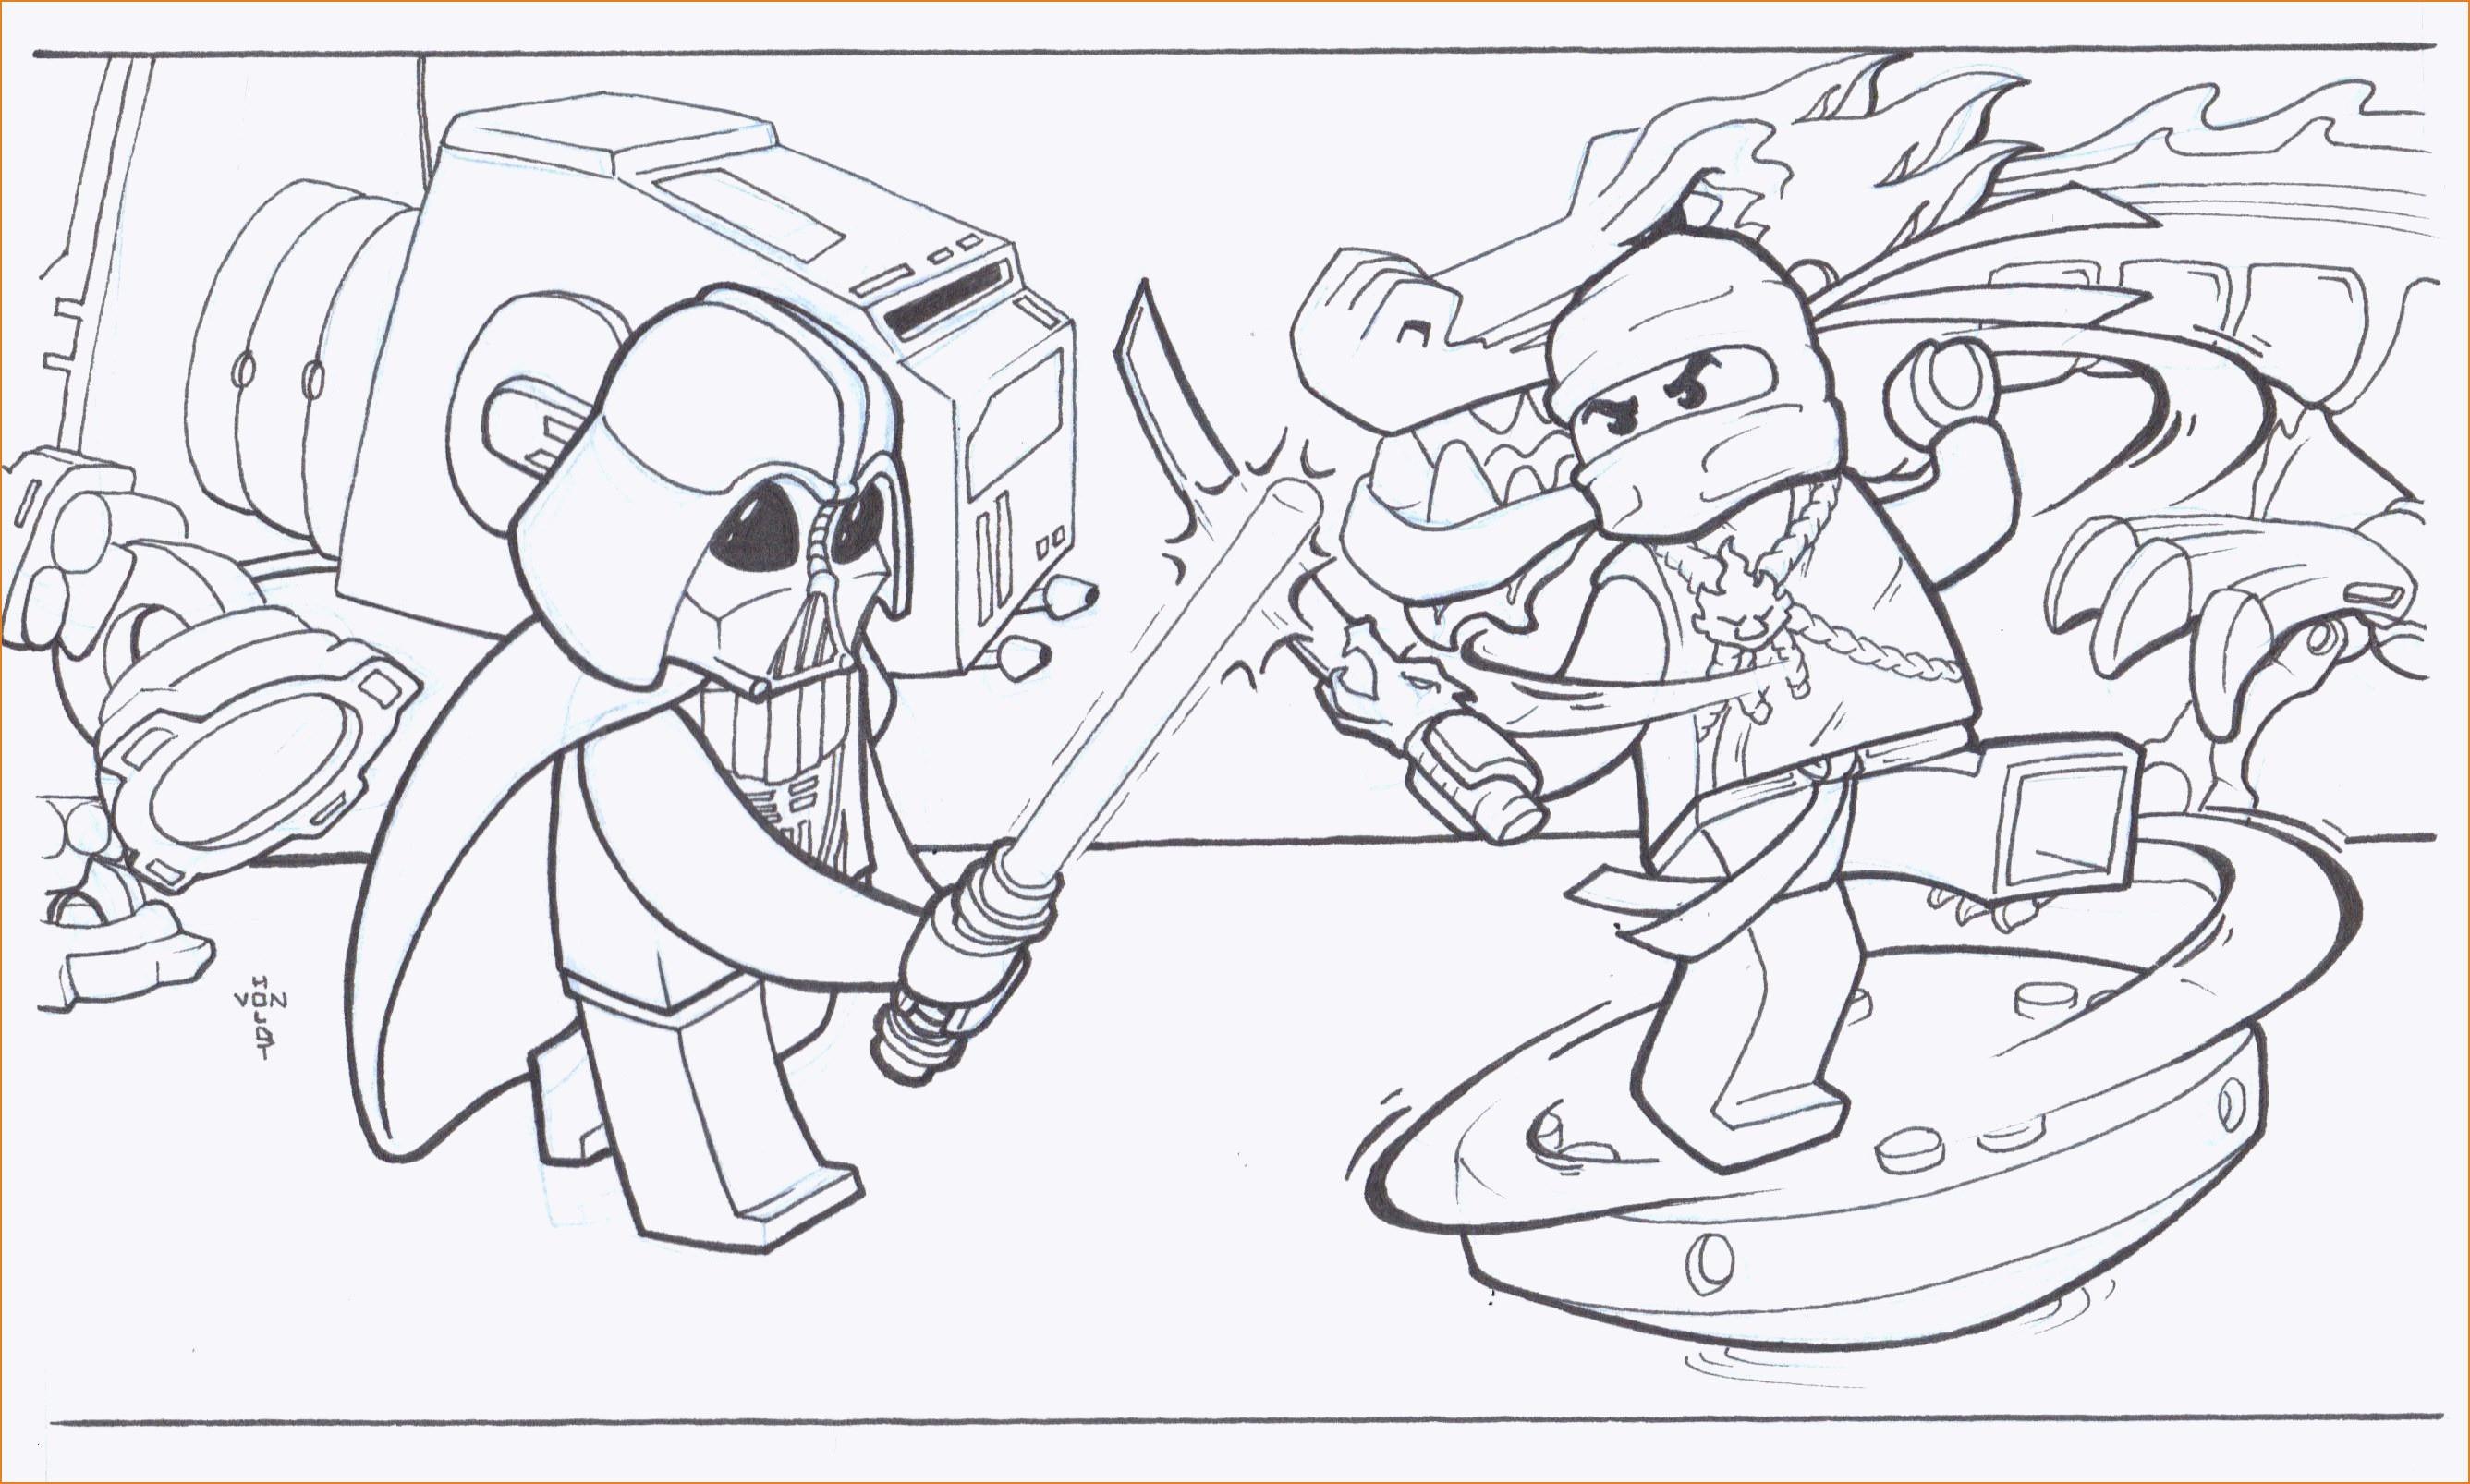 Ausmalbilder Kostenlos Ninjago Neu Ausmalbilder Kostenlos Für Erwachsene Uploadertalk Elegant Ninjago Bild